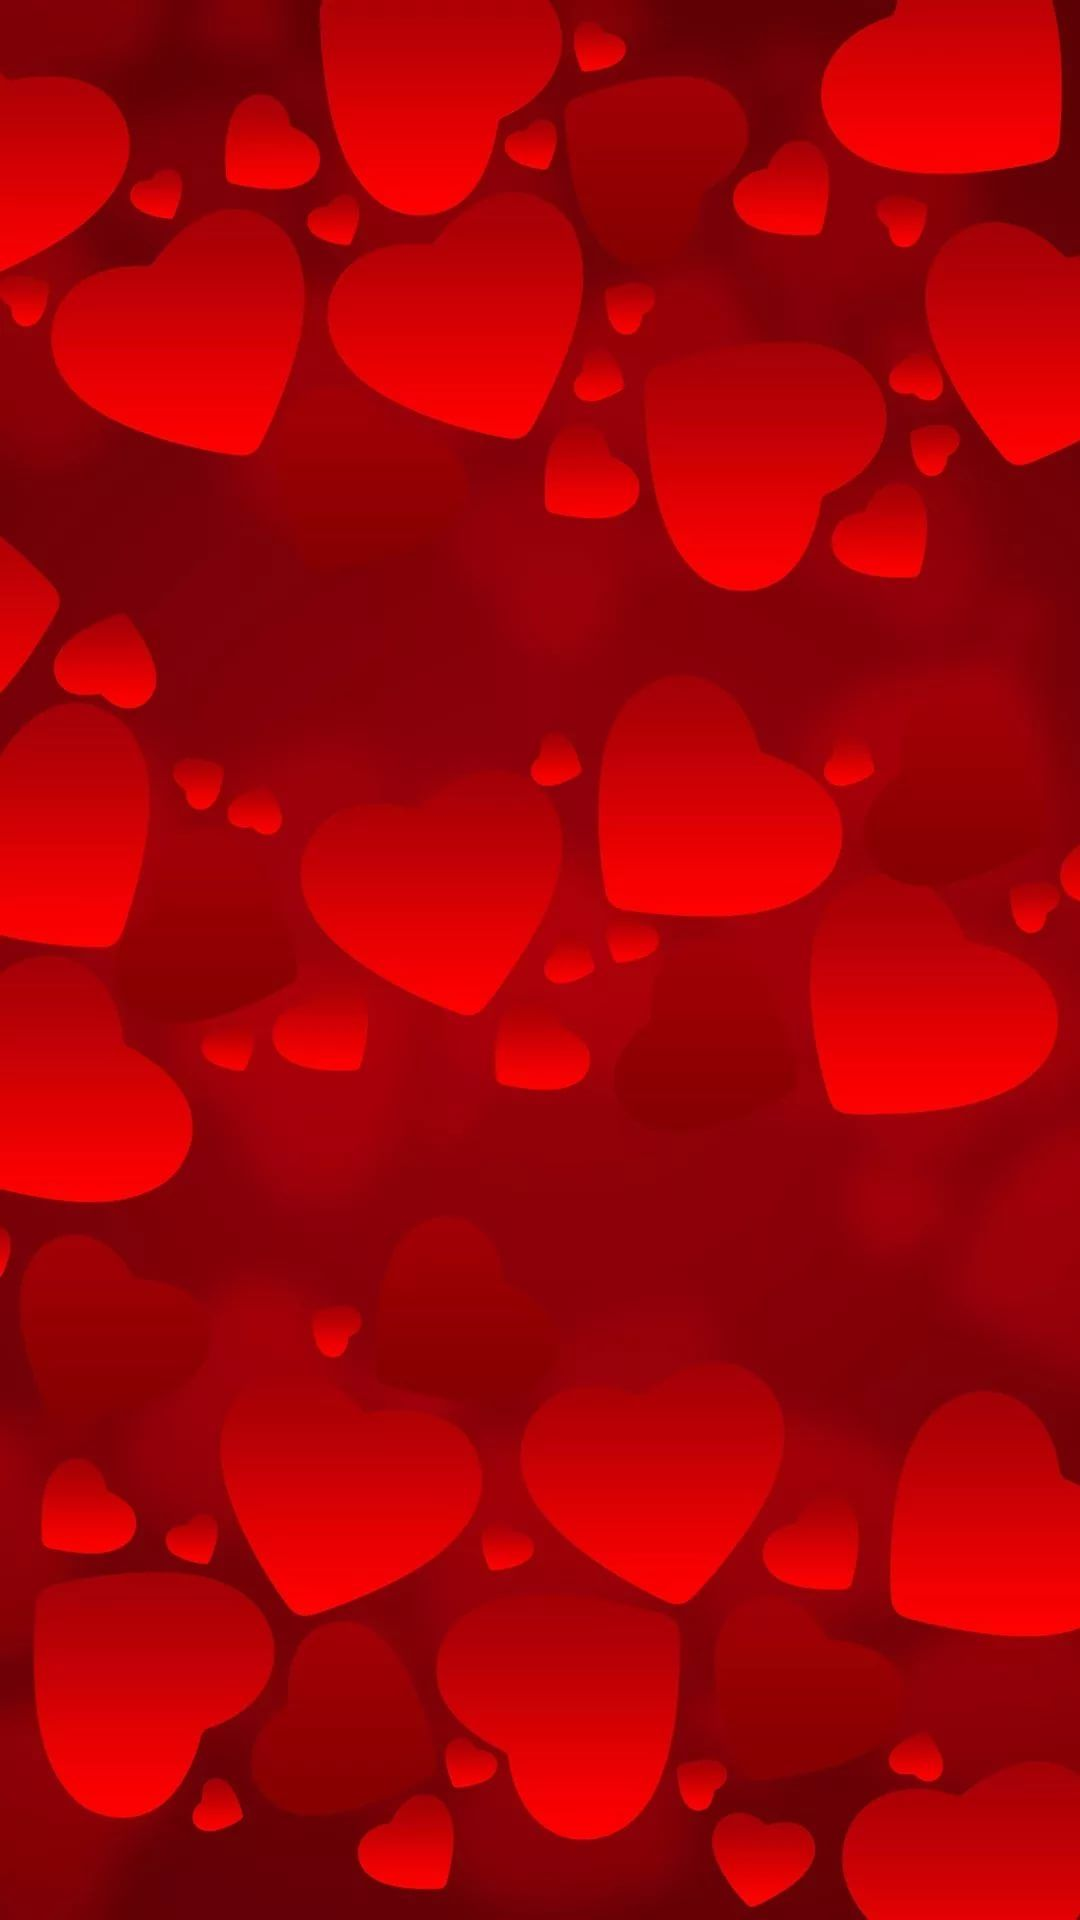 Valentine's Day iPhone 6 wallpaper